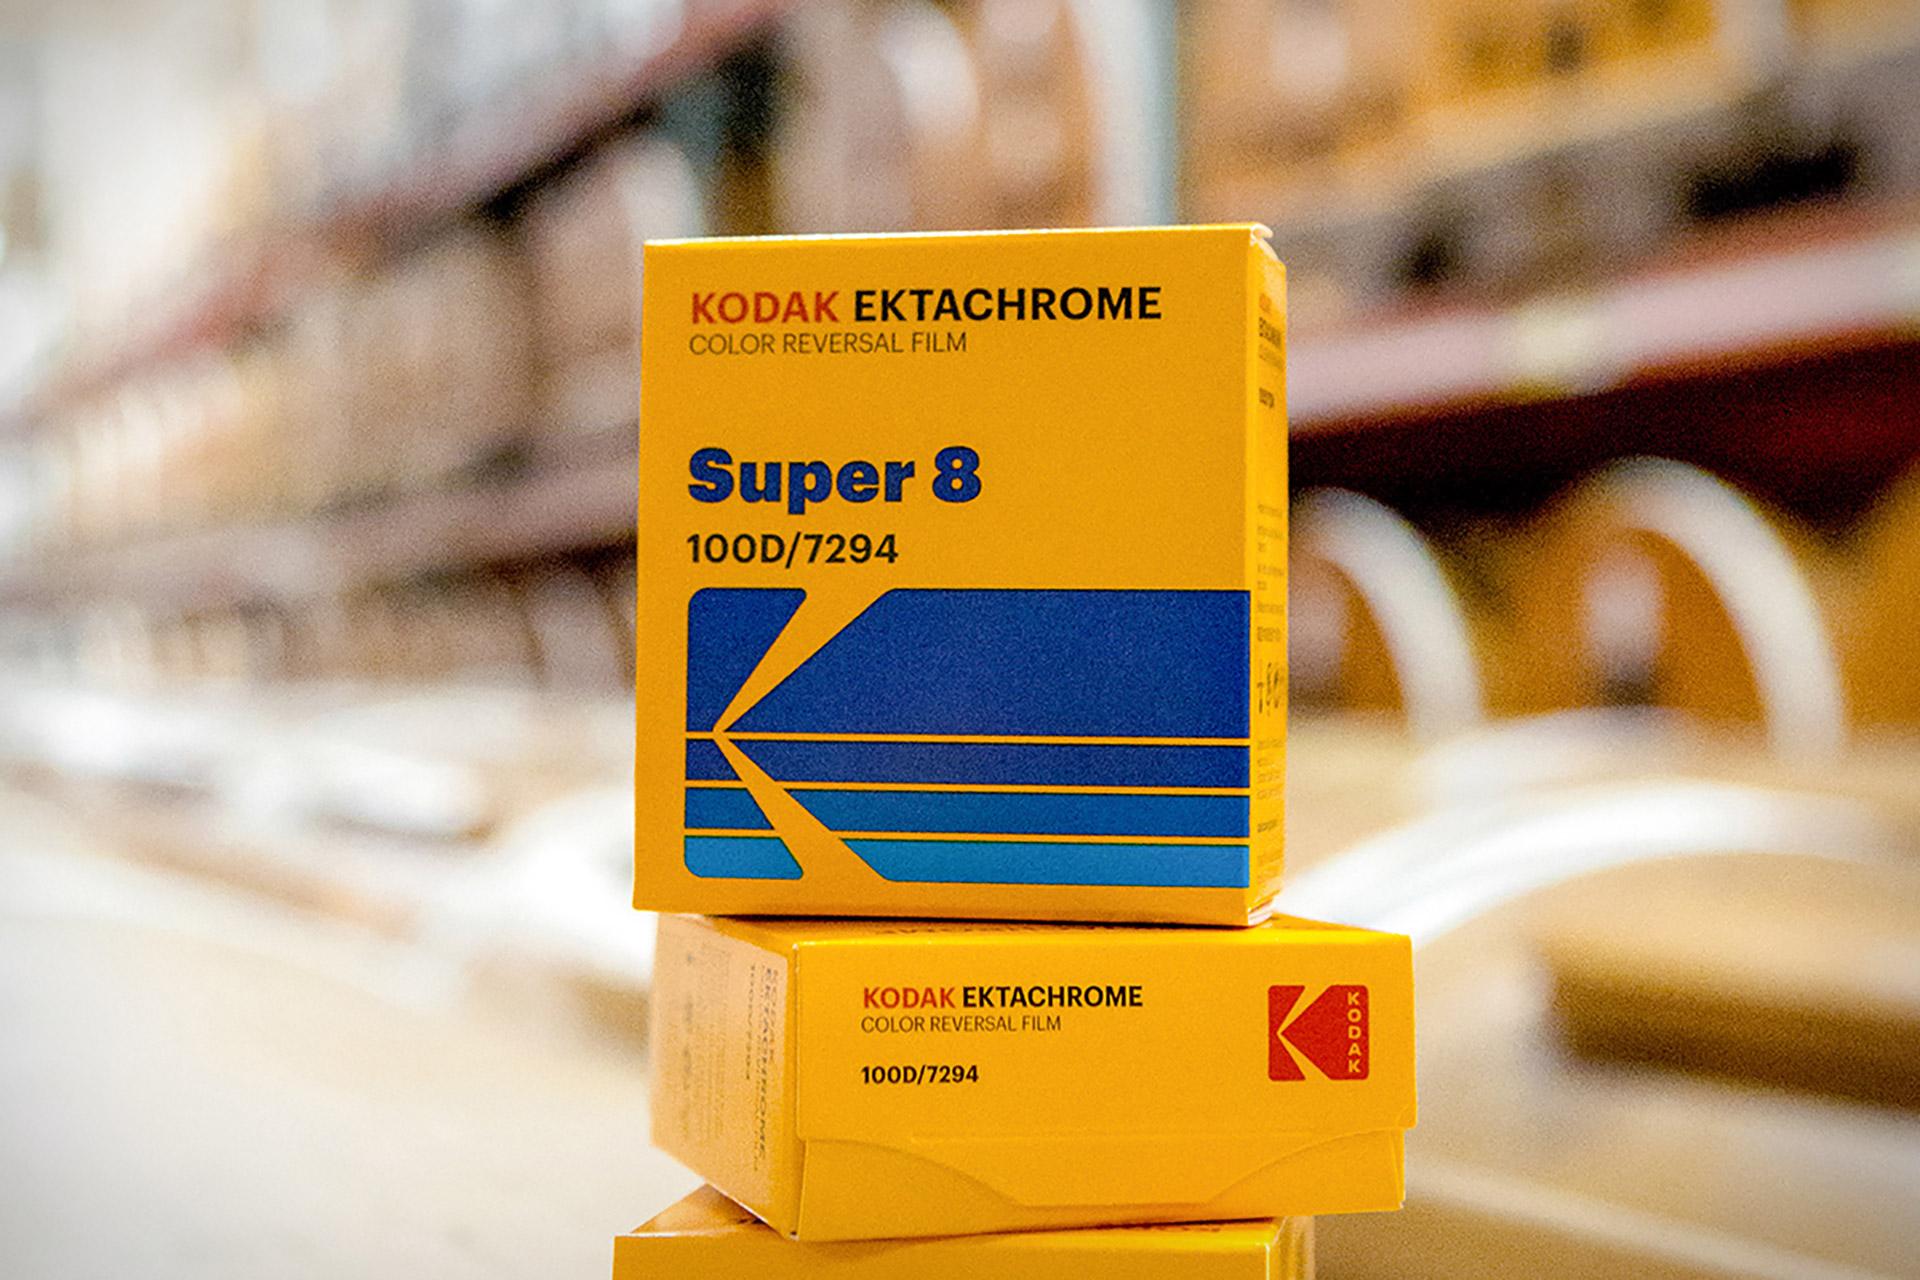 Kodak Professional Ektachrome Film